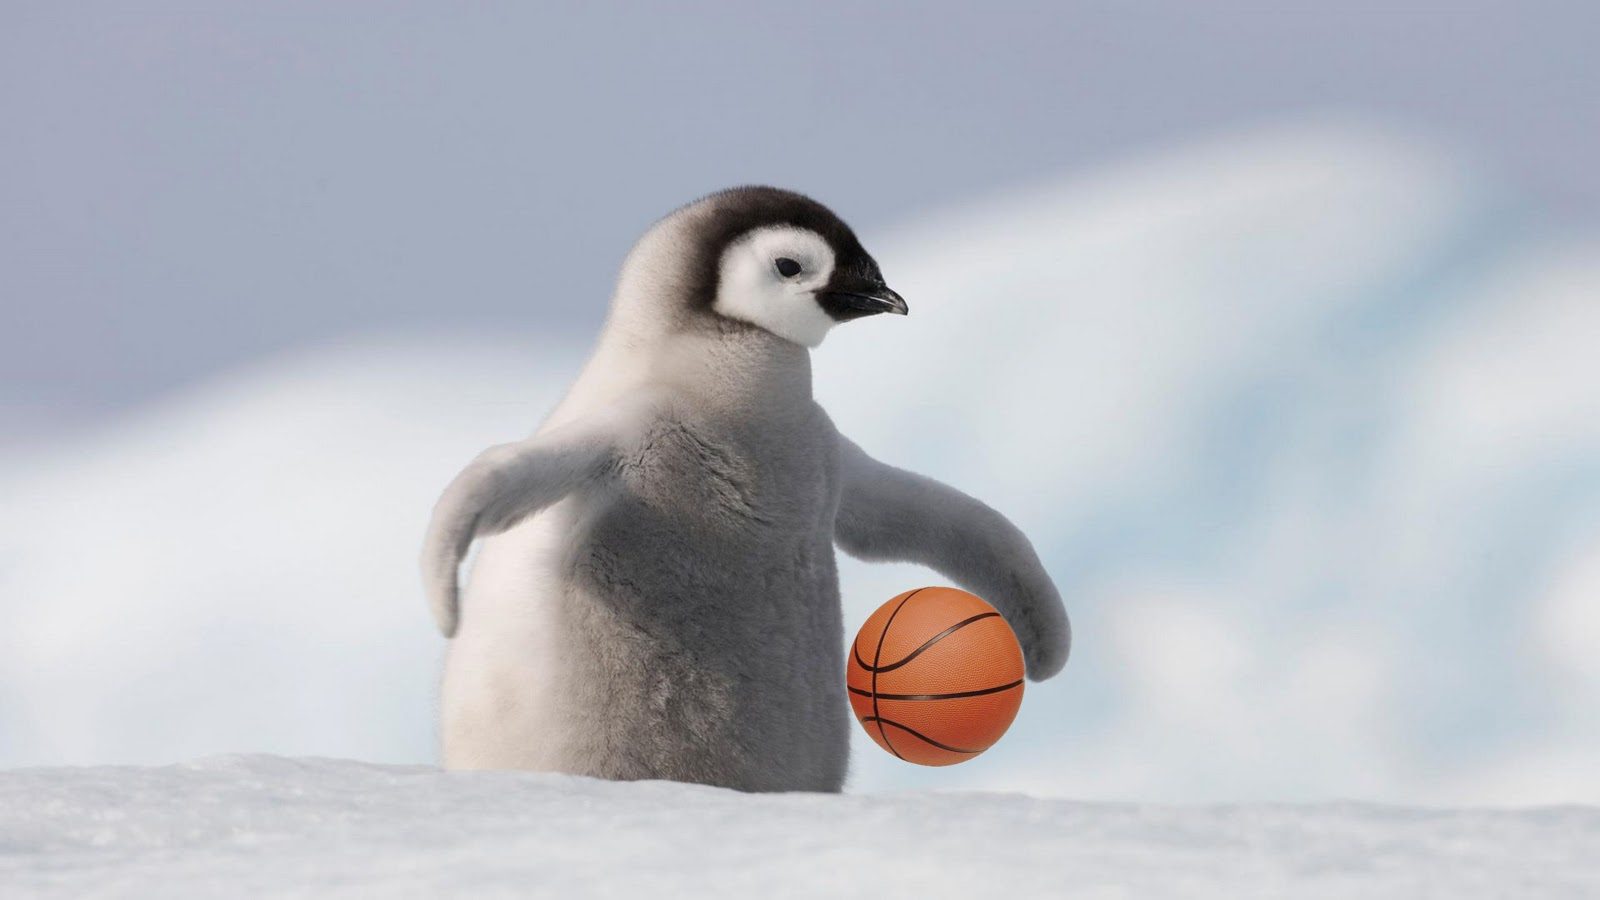 Cute penguin - photo#23